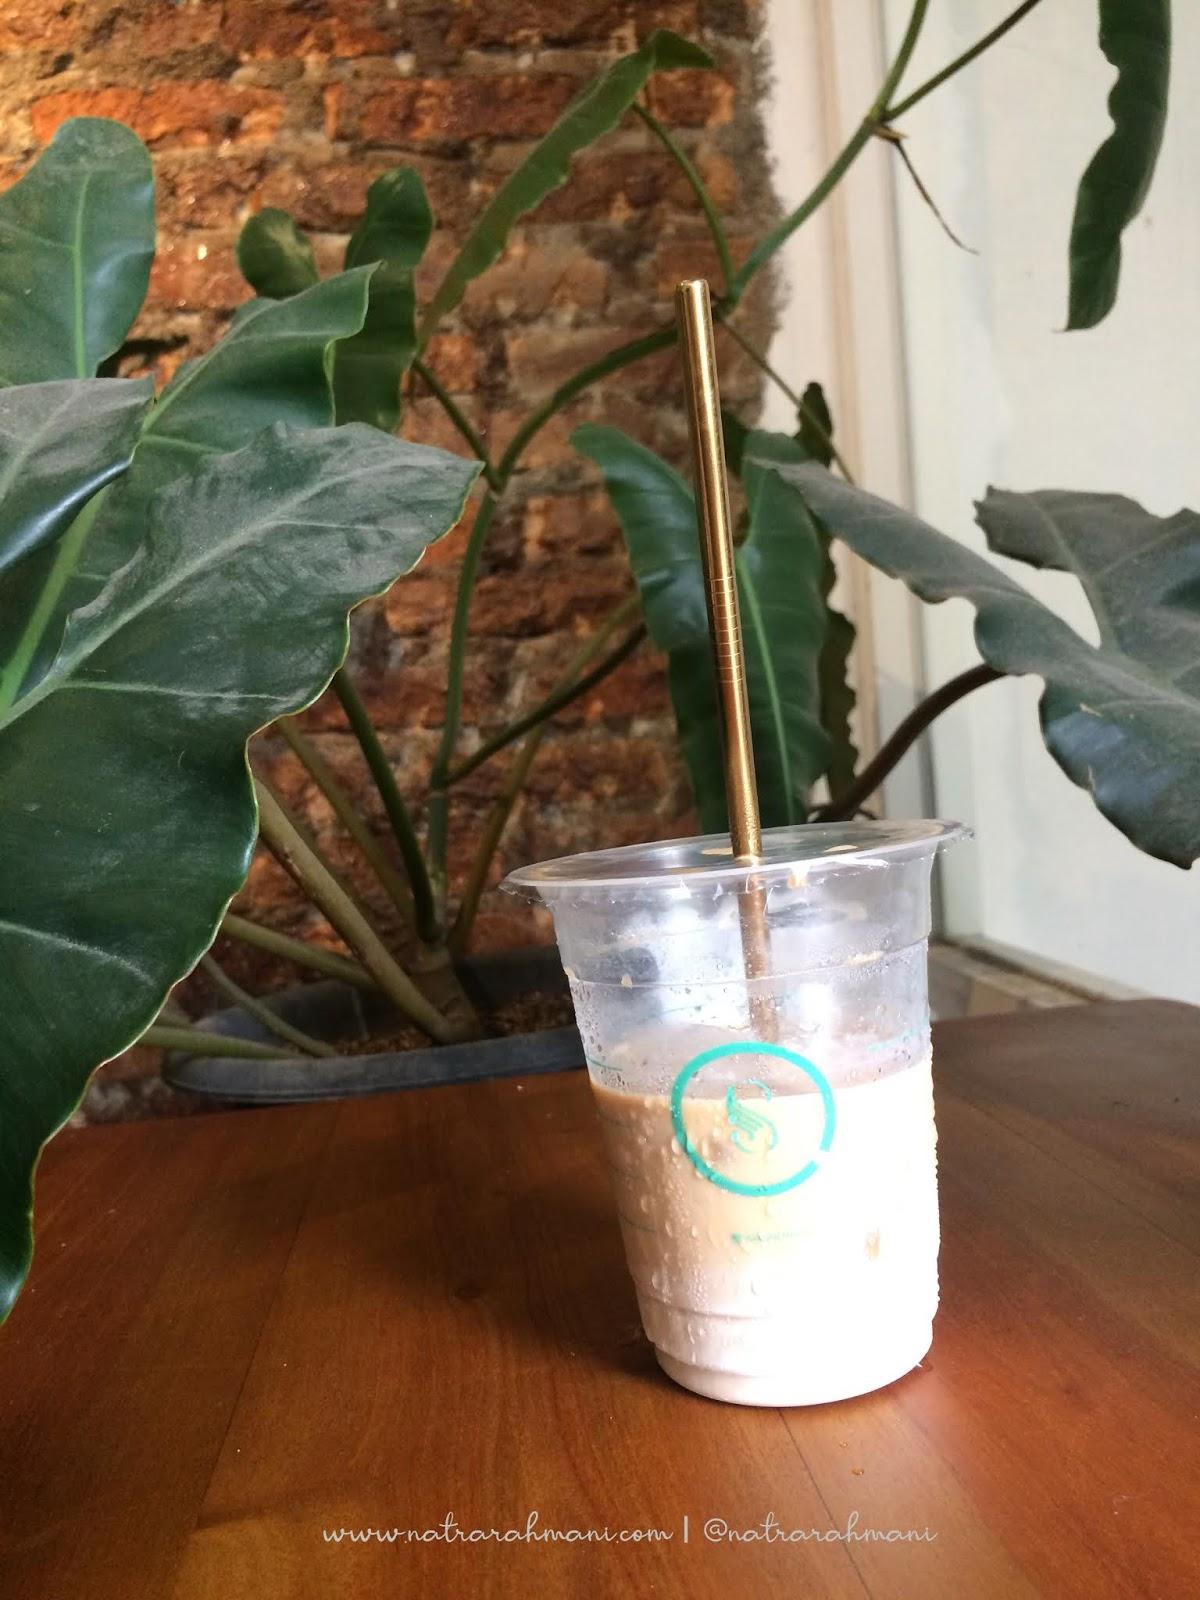 sasada-kopi-medan-natrarahmani